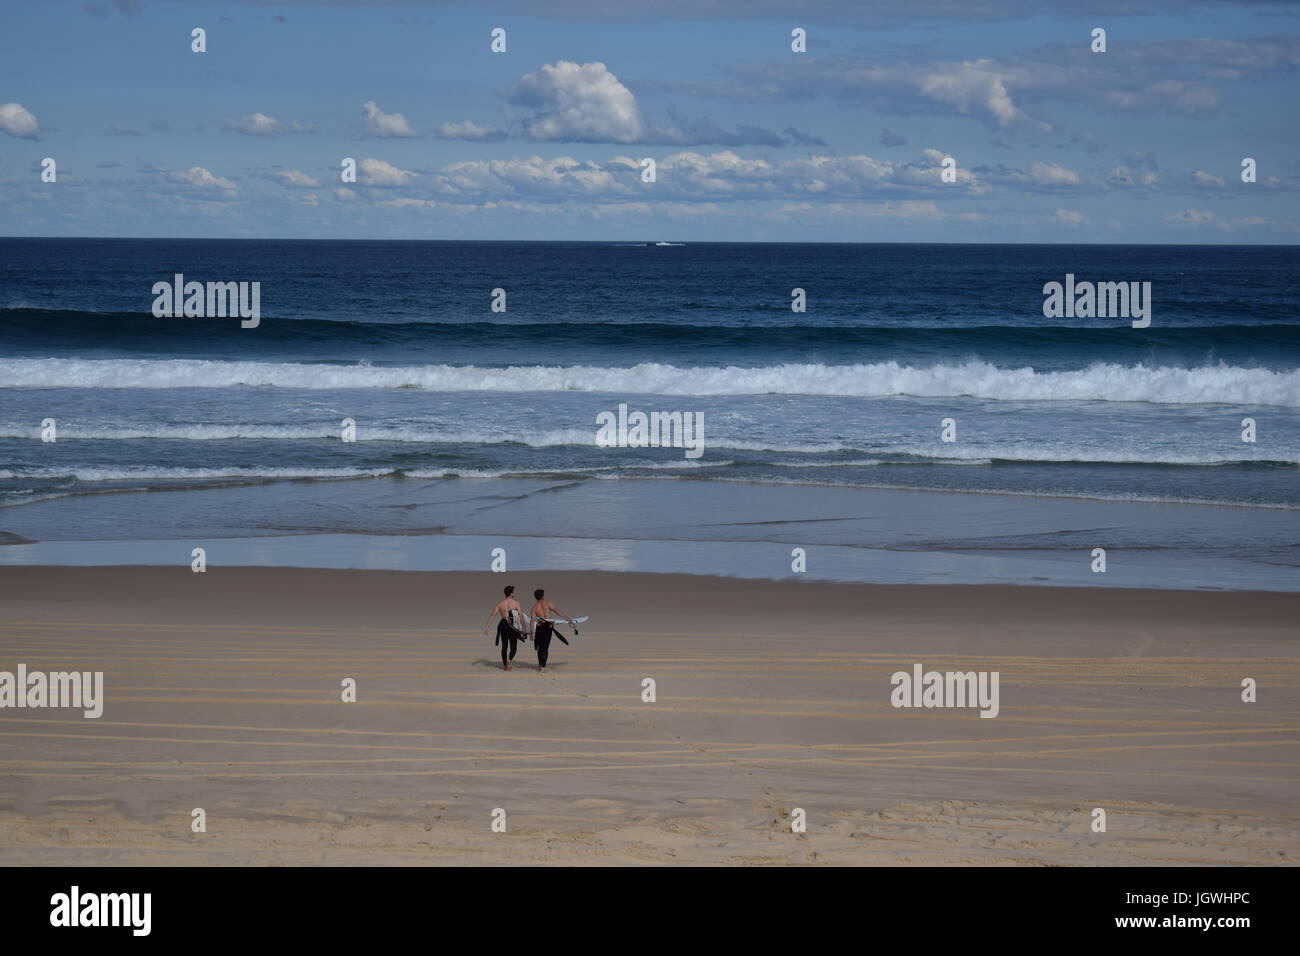 Two surfers on Australian Beach - Stock Image